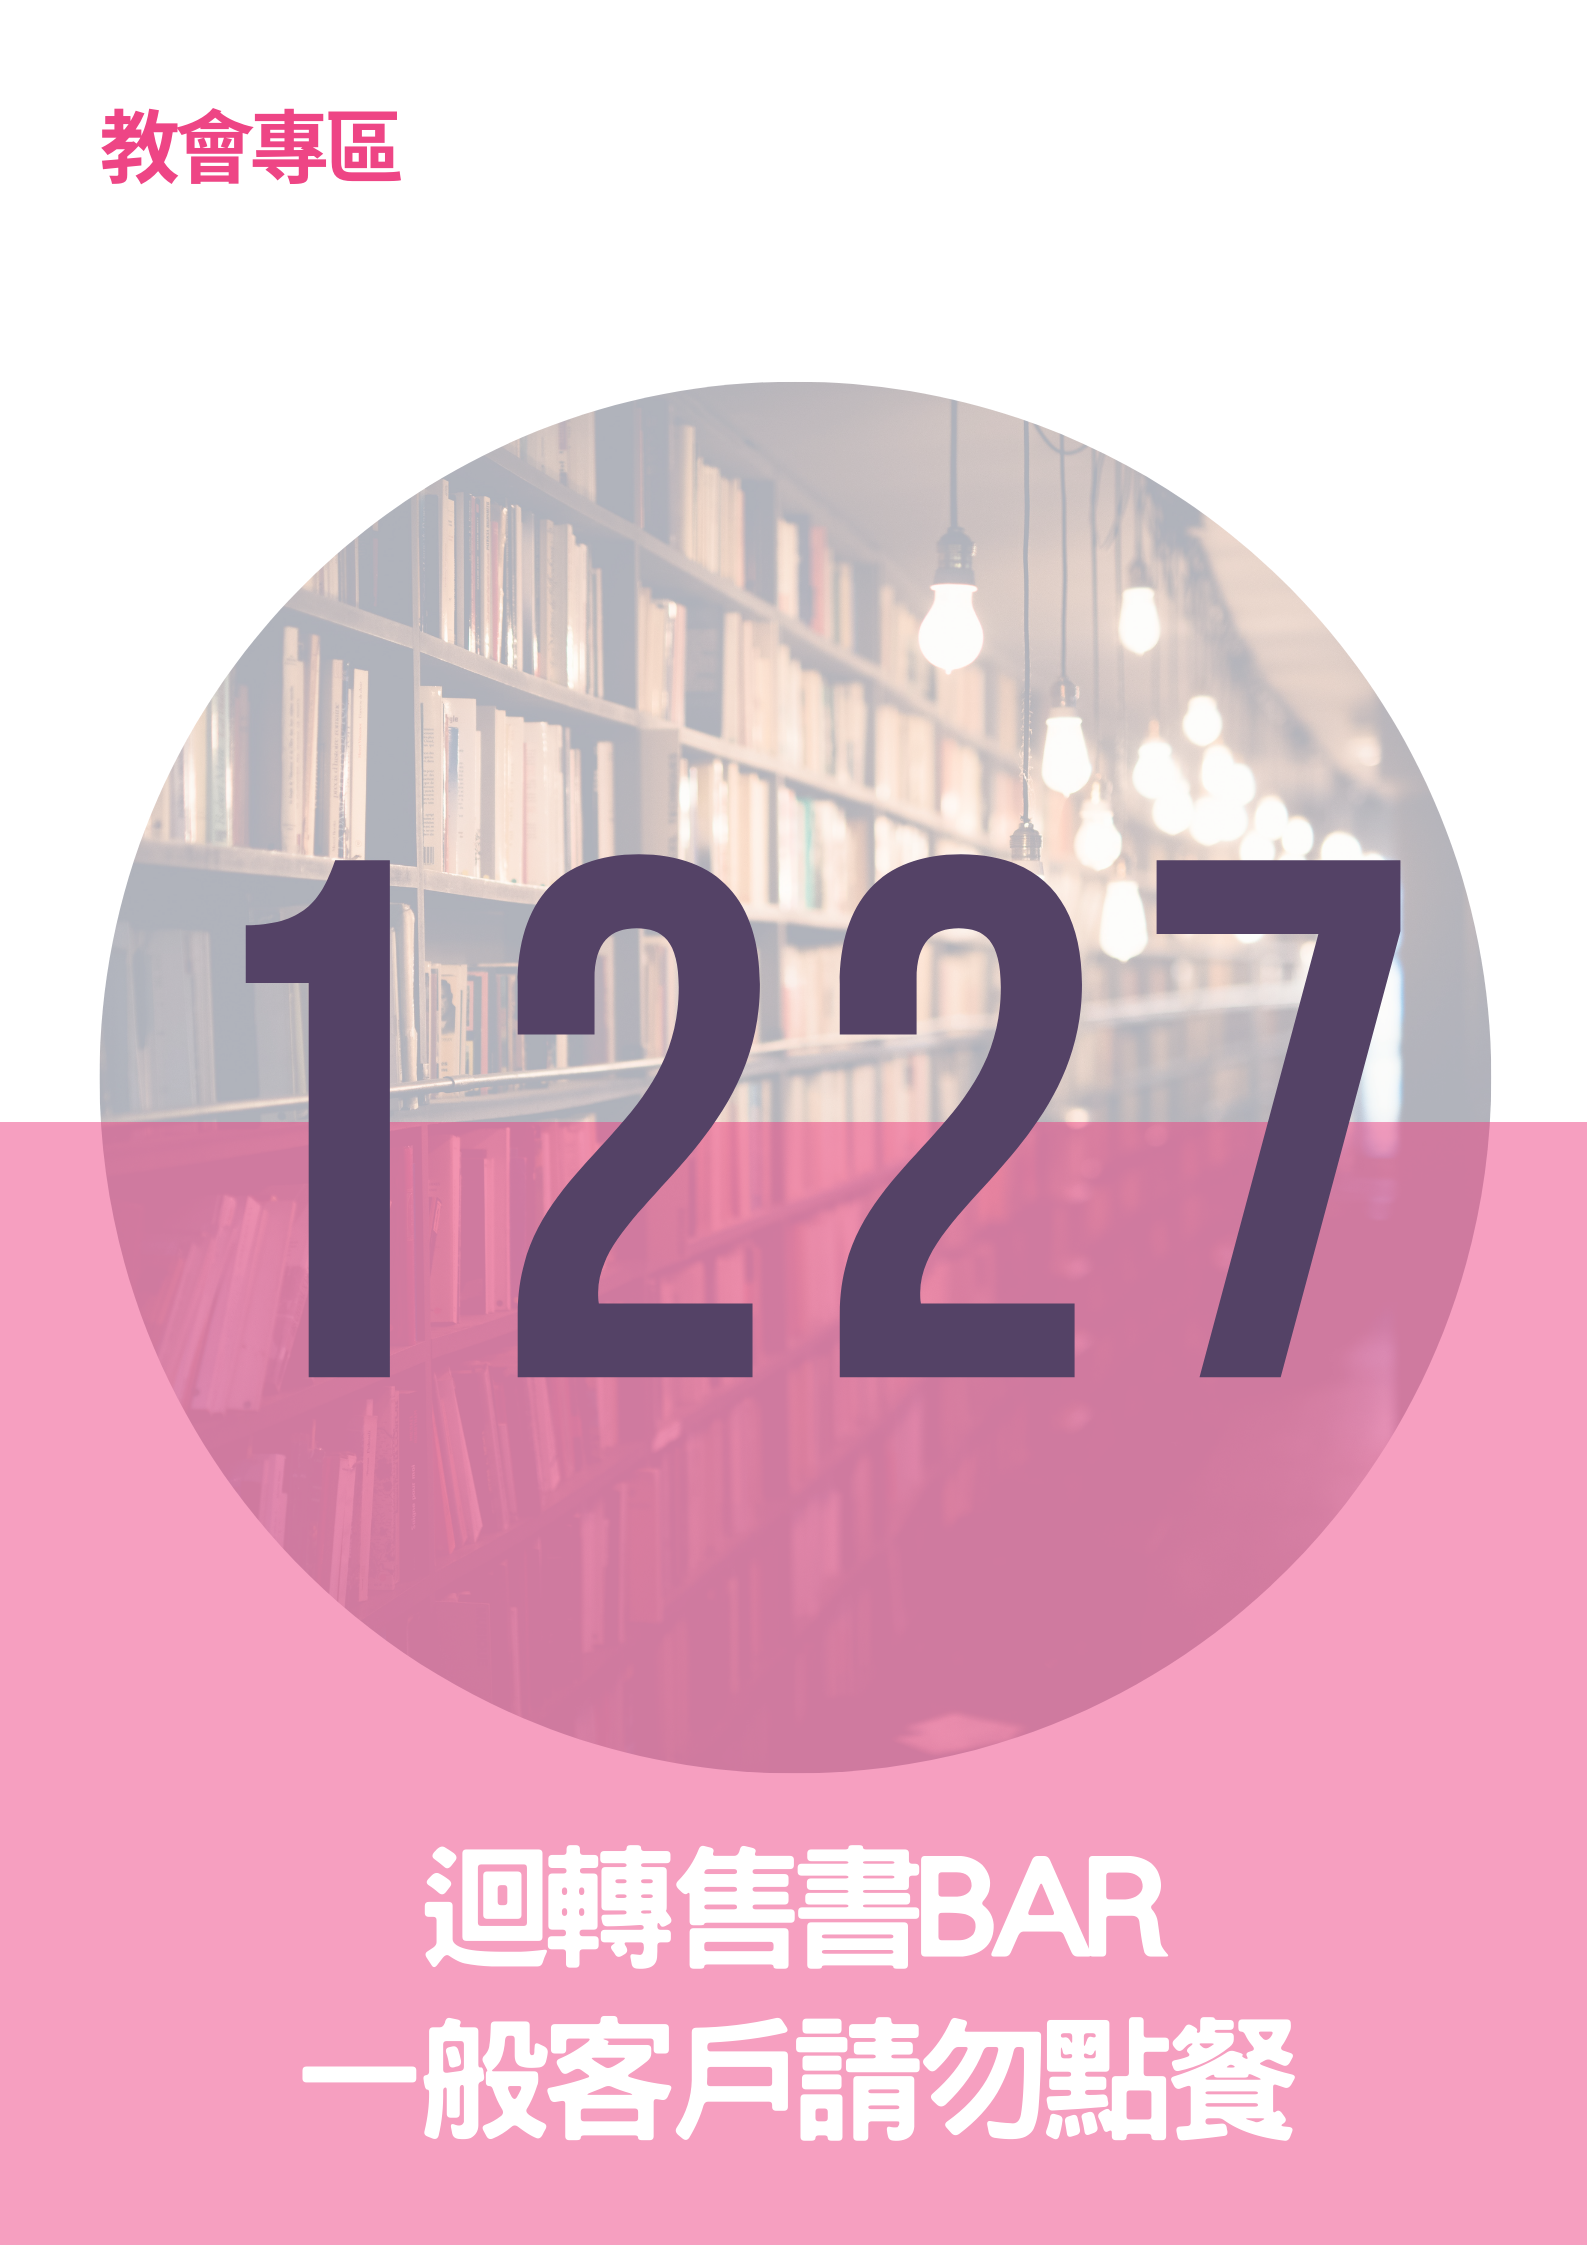 17296220